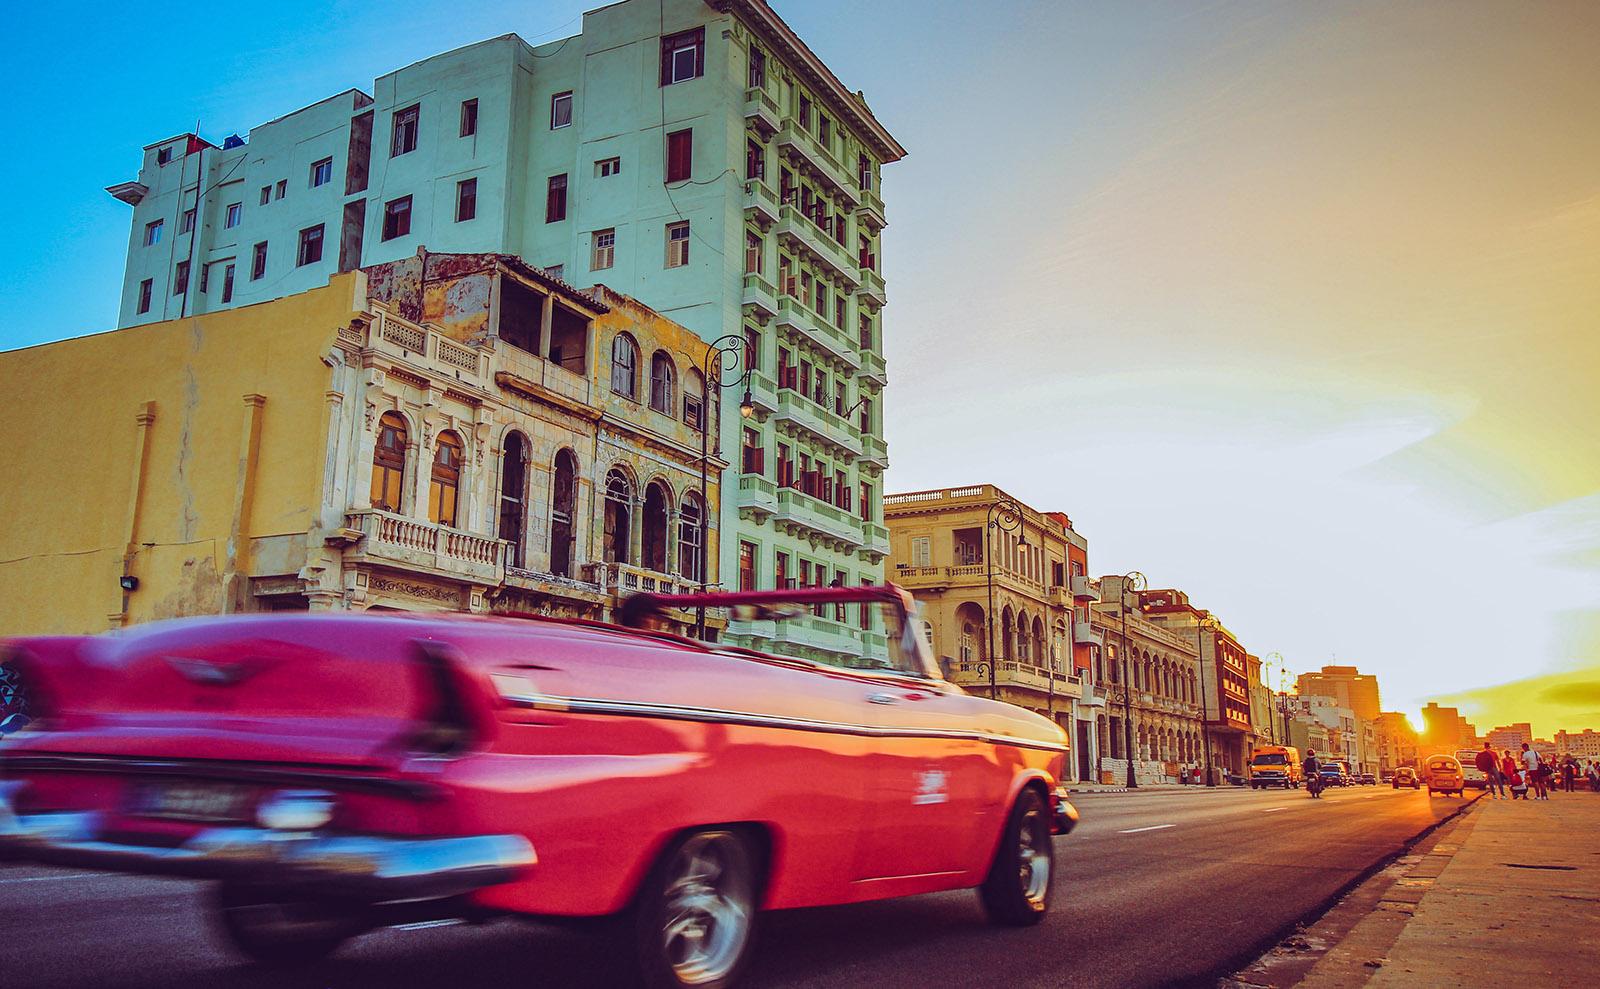 street view of havana with vintage car